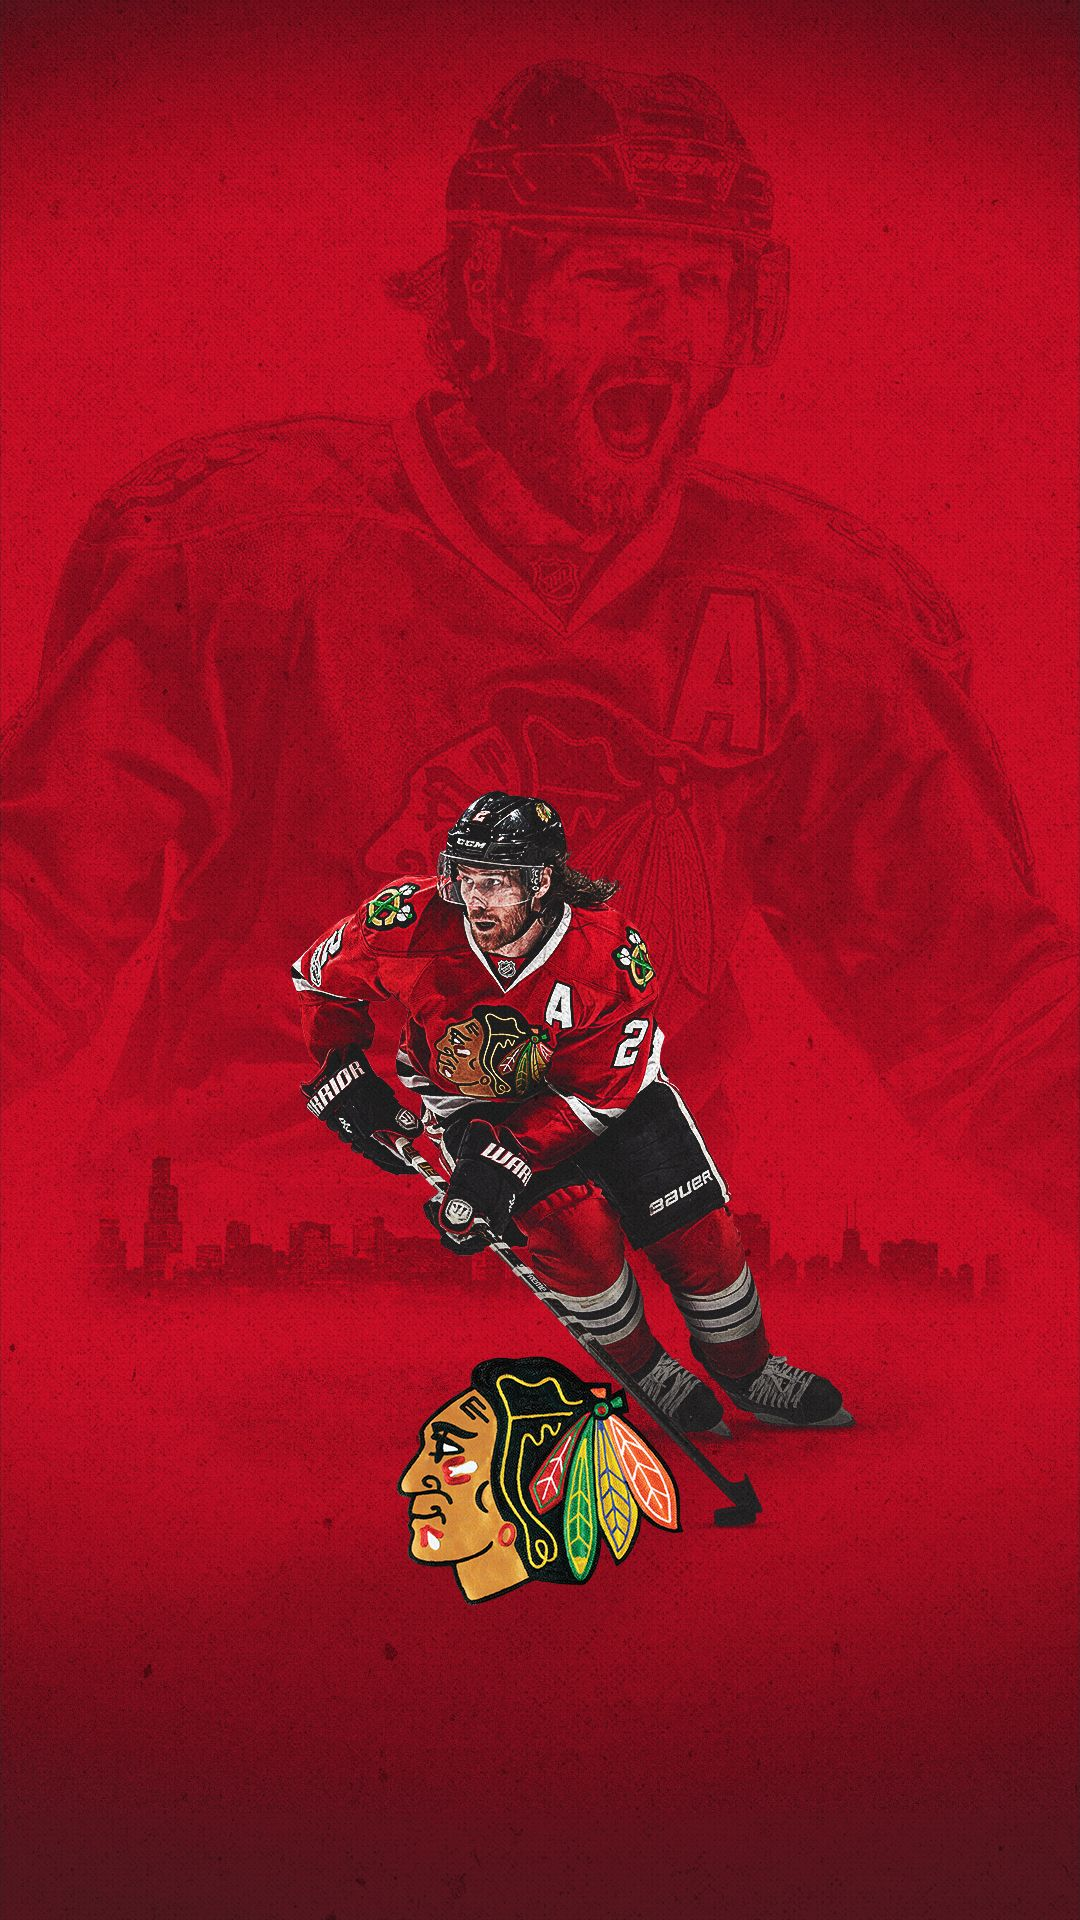 Pin By Chris Stewart On Hockey Chicago Blackhawks Wallpaper Chicago Blackhawks Funny Chicago Blackhawks Hockey